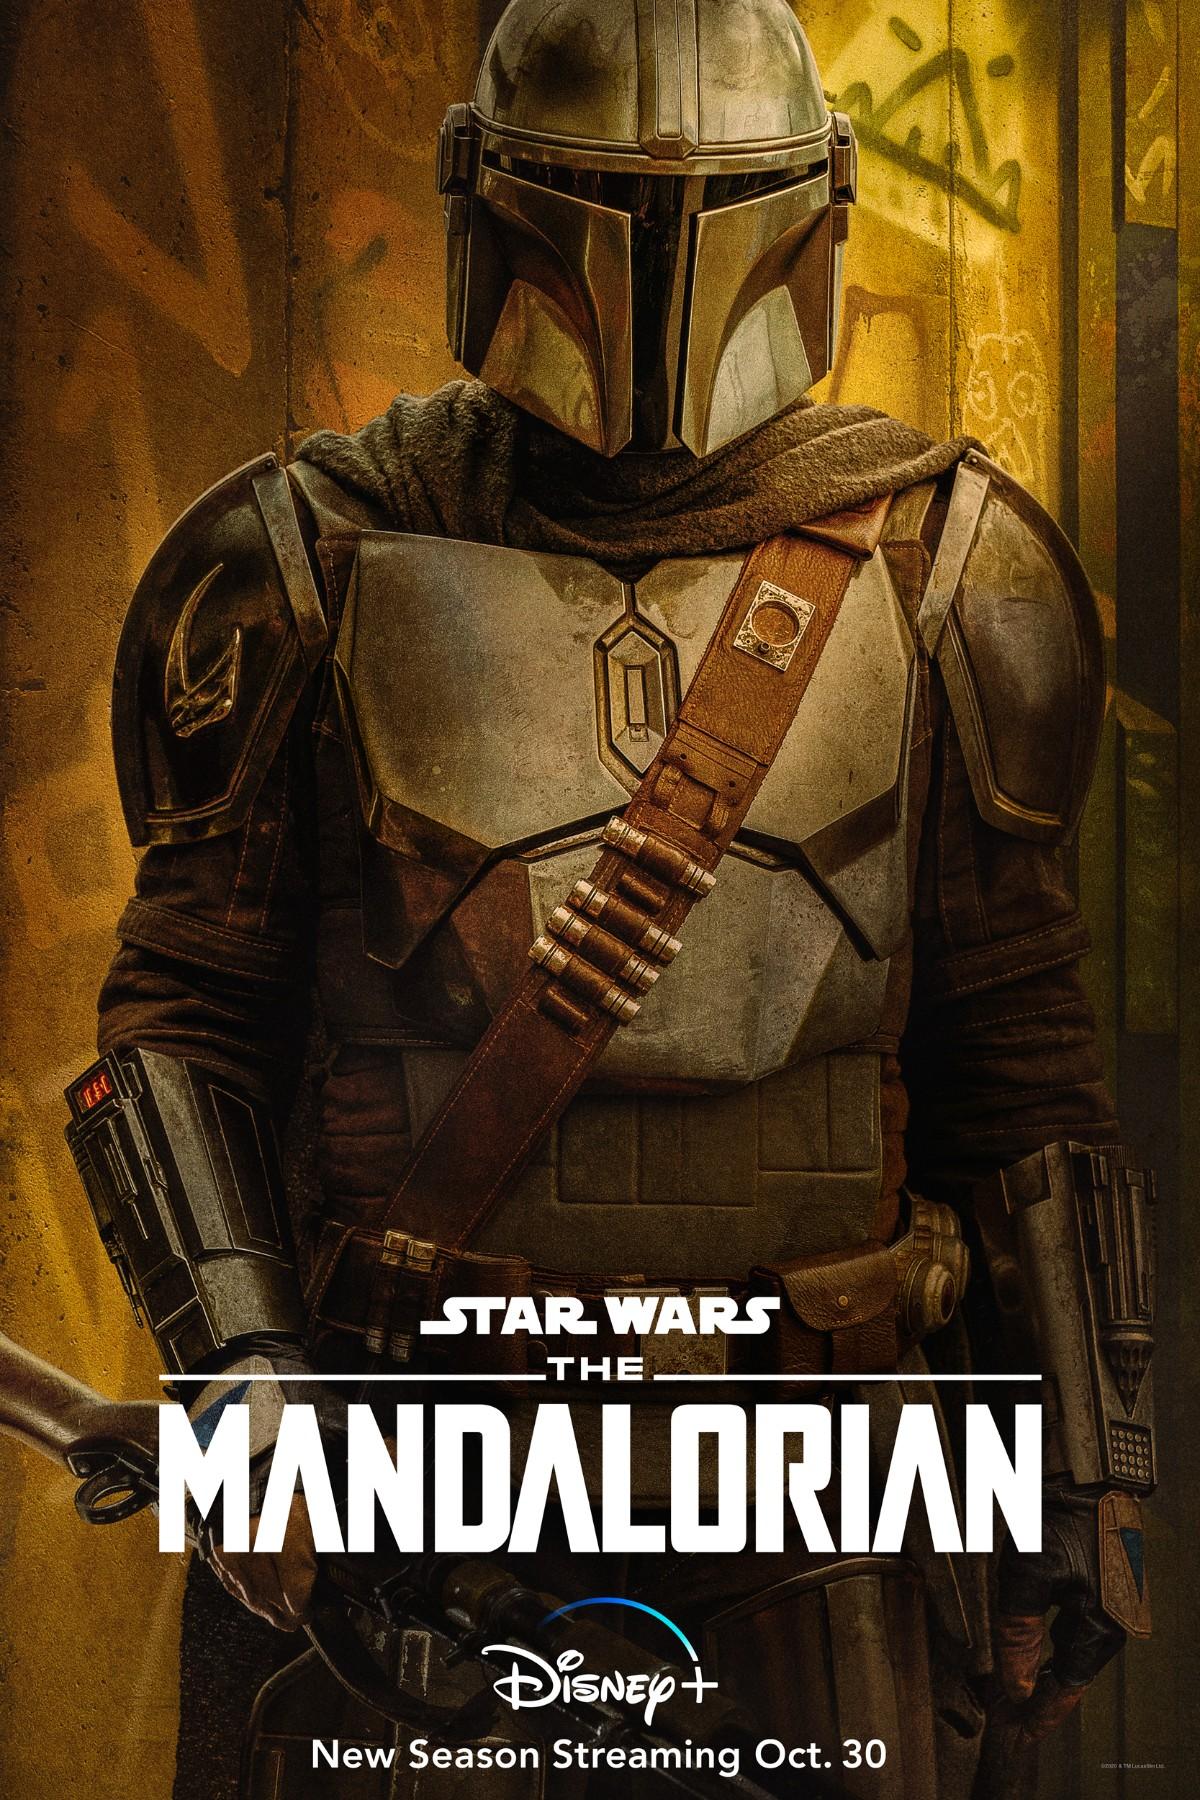 No Big Deal, Just Baby Yoda Looking Super Adorable Ahead Of The Mandalorian Season 2 #2478967